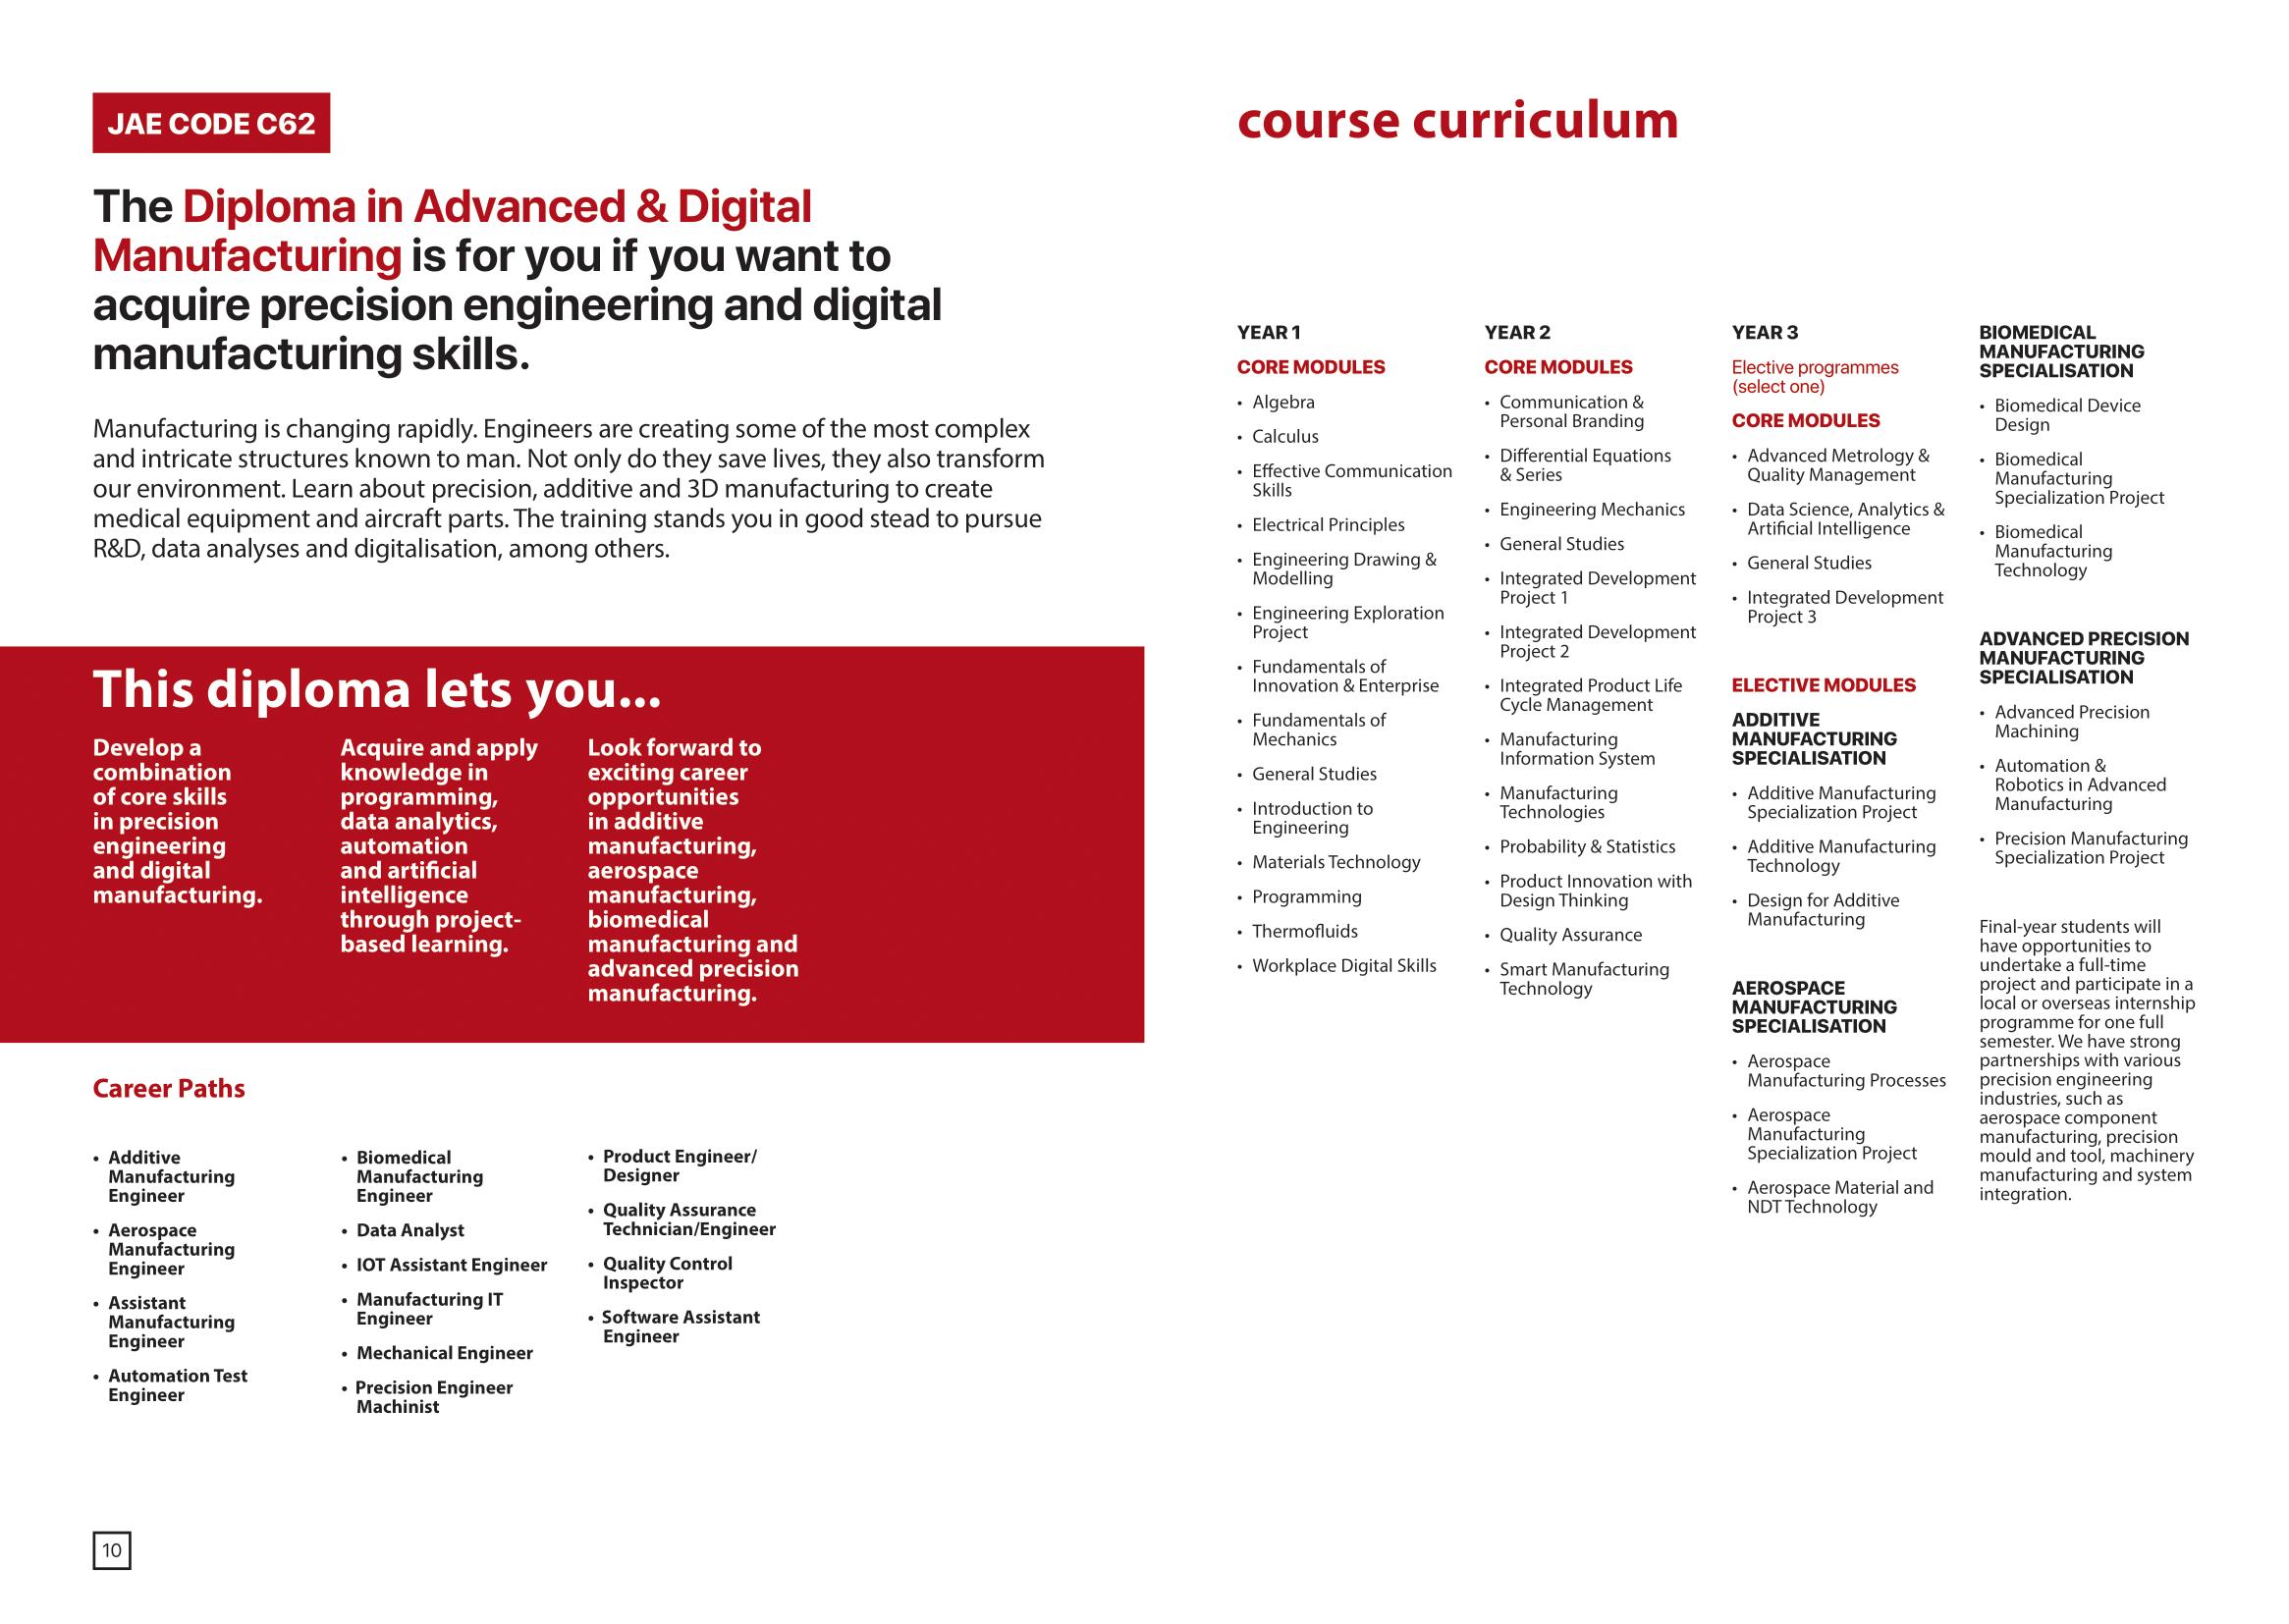 School of Engineering 2020-07